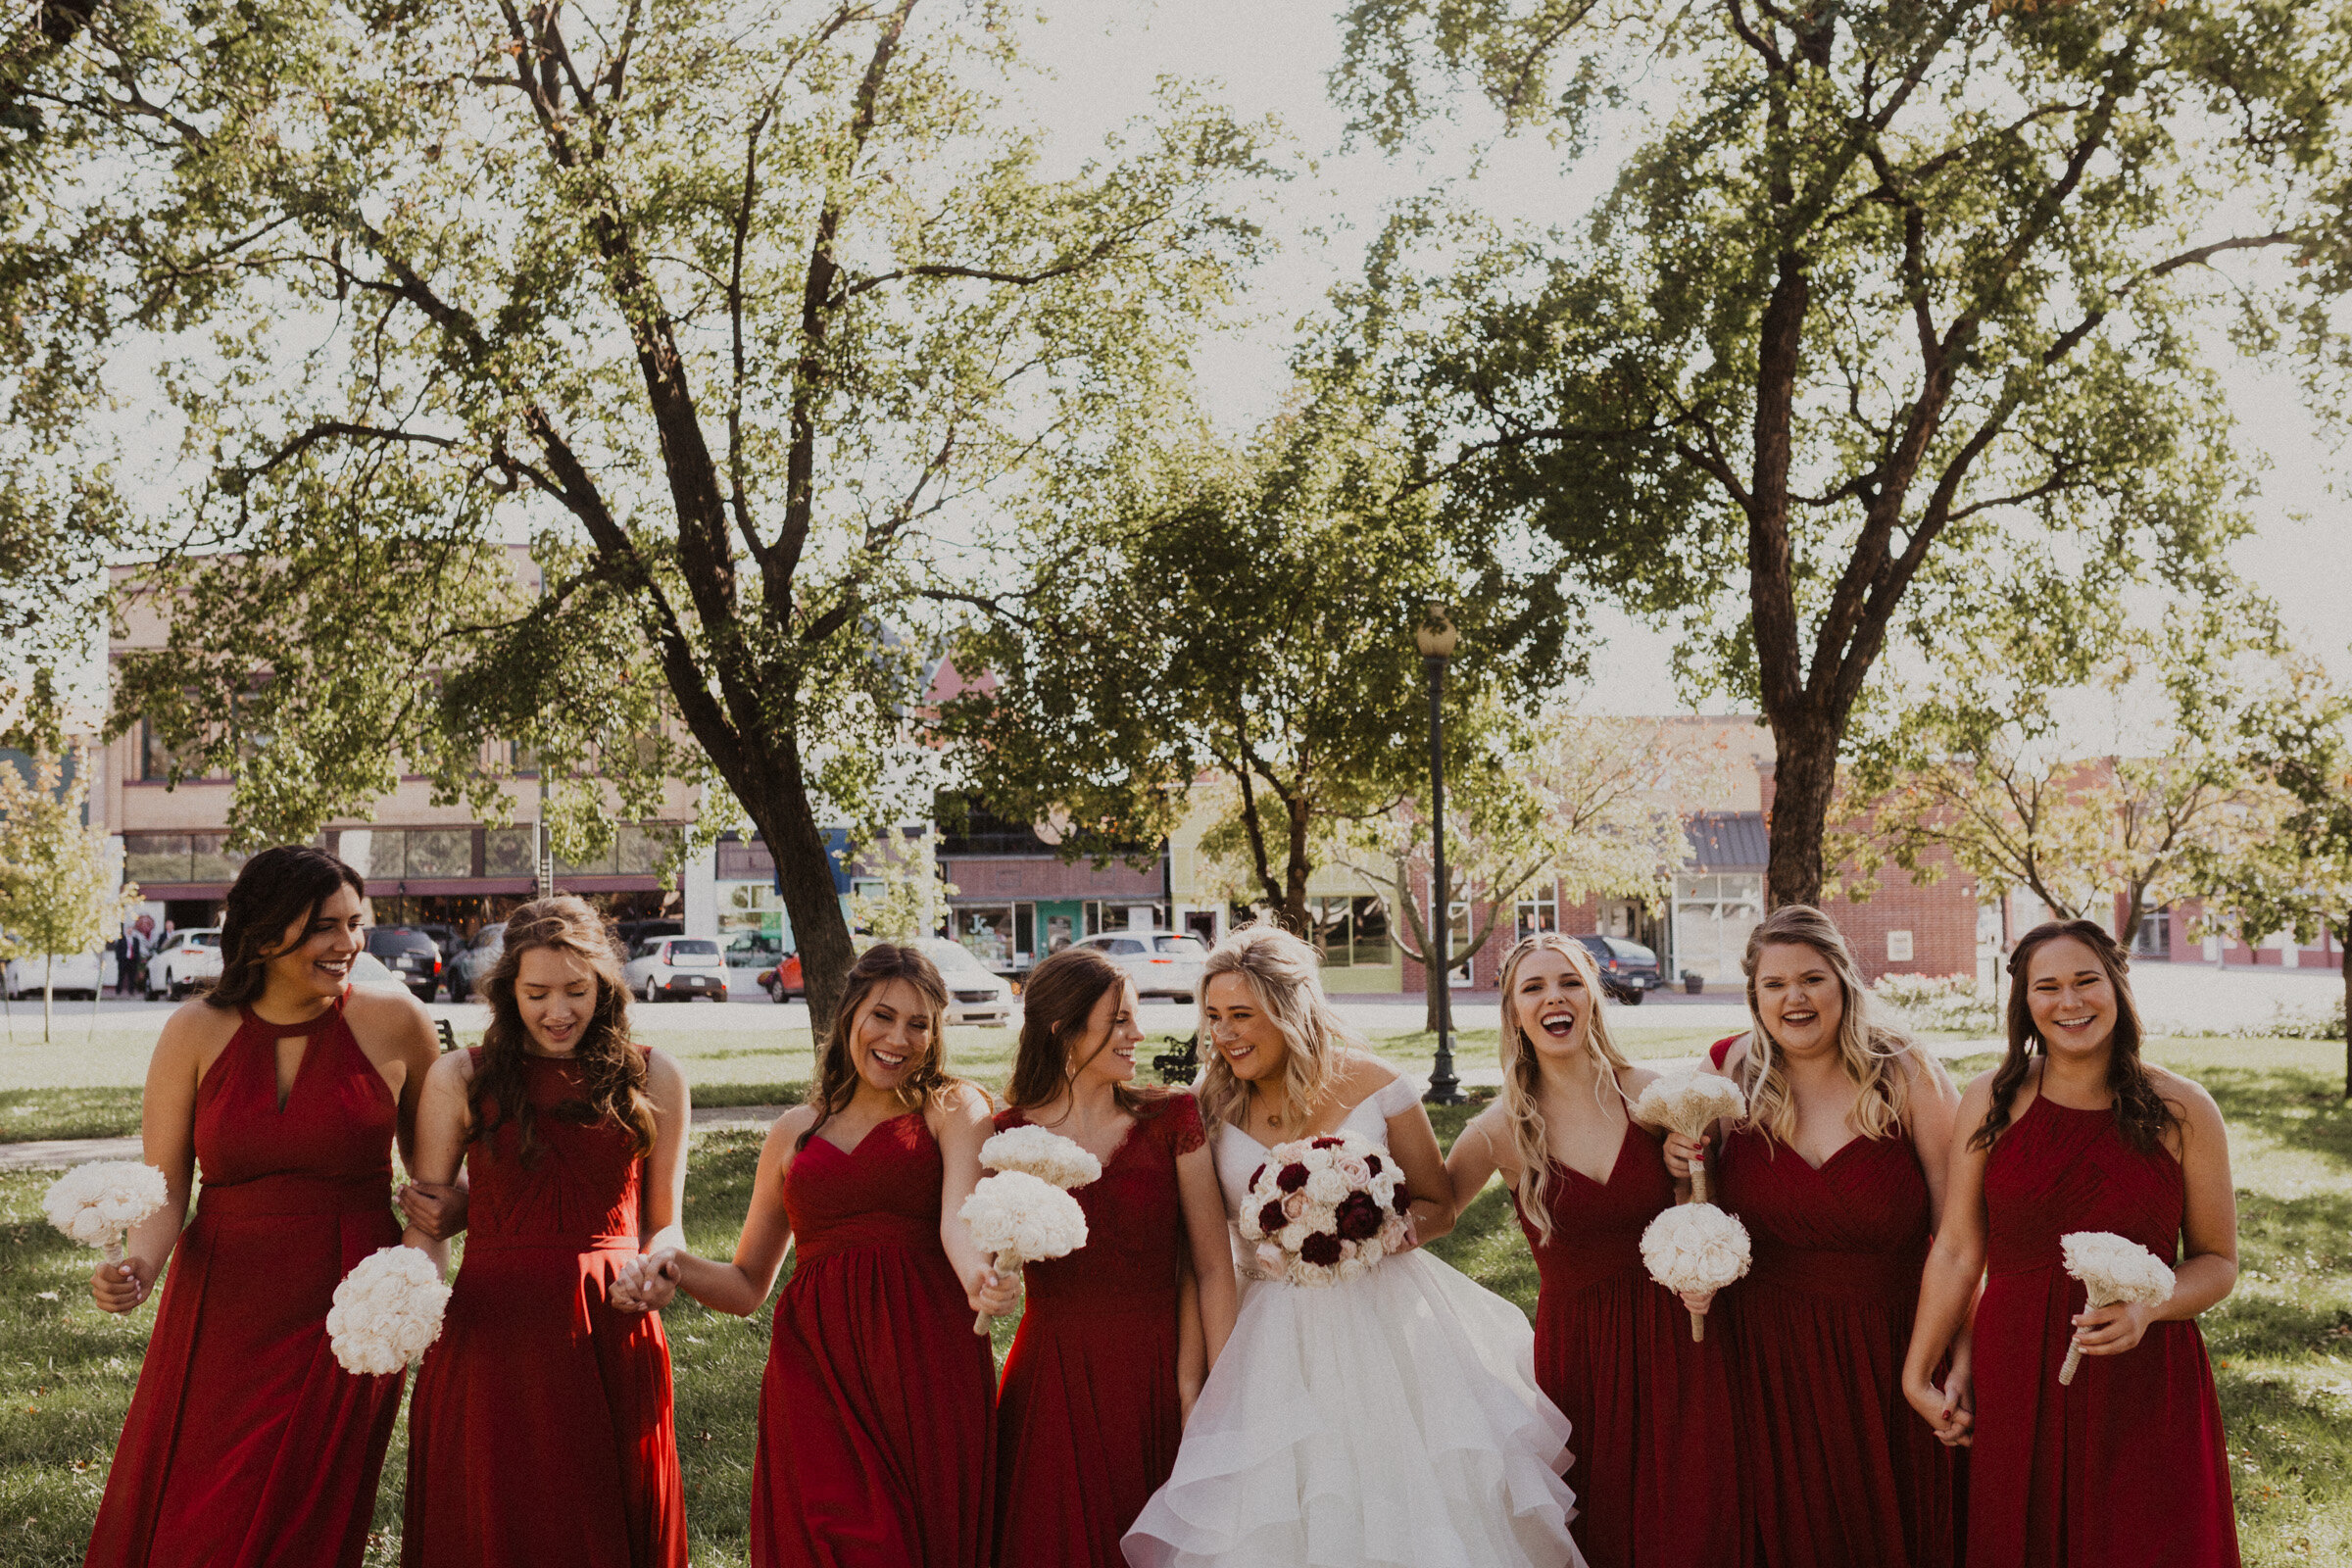 alyssa barletter photography town square paola wedding-15.jpg